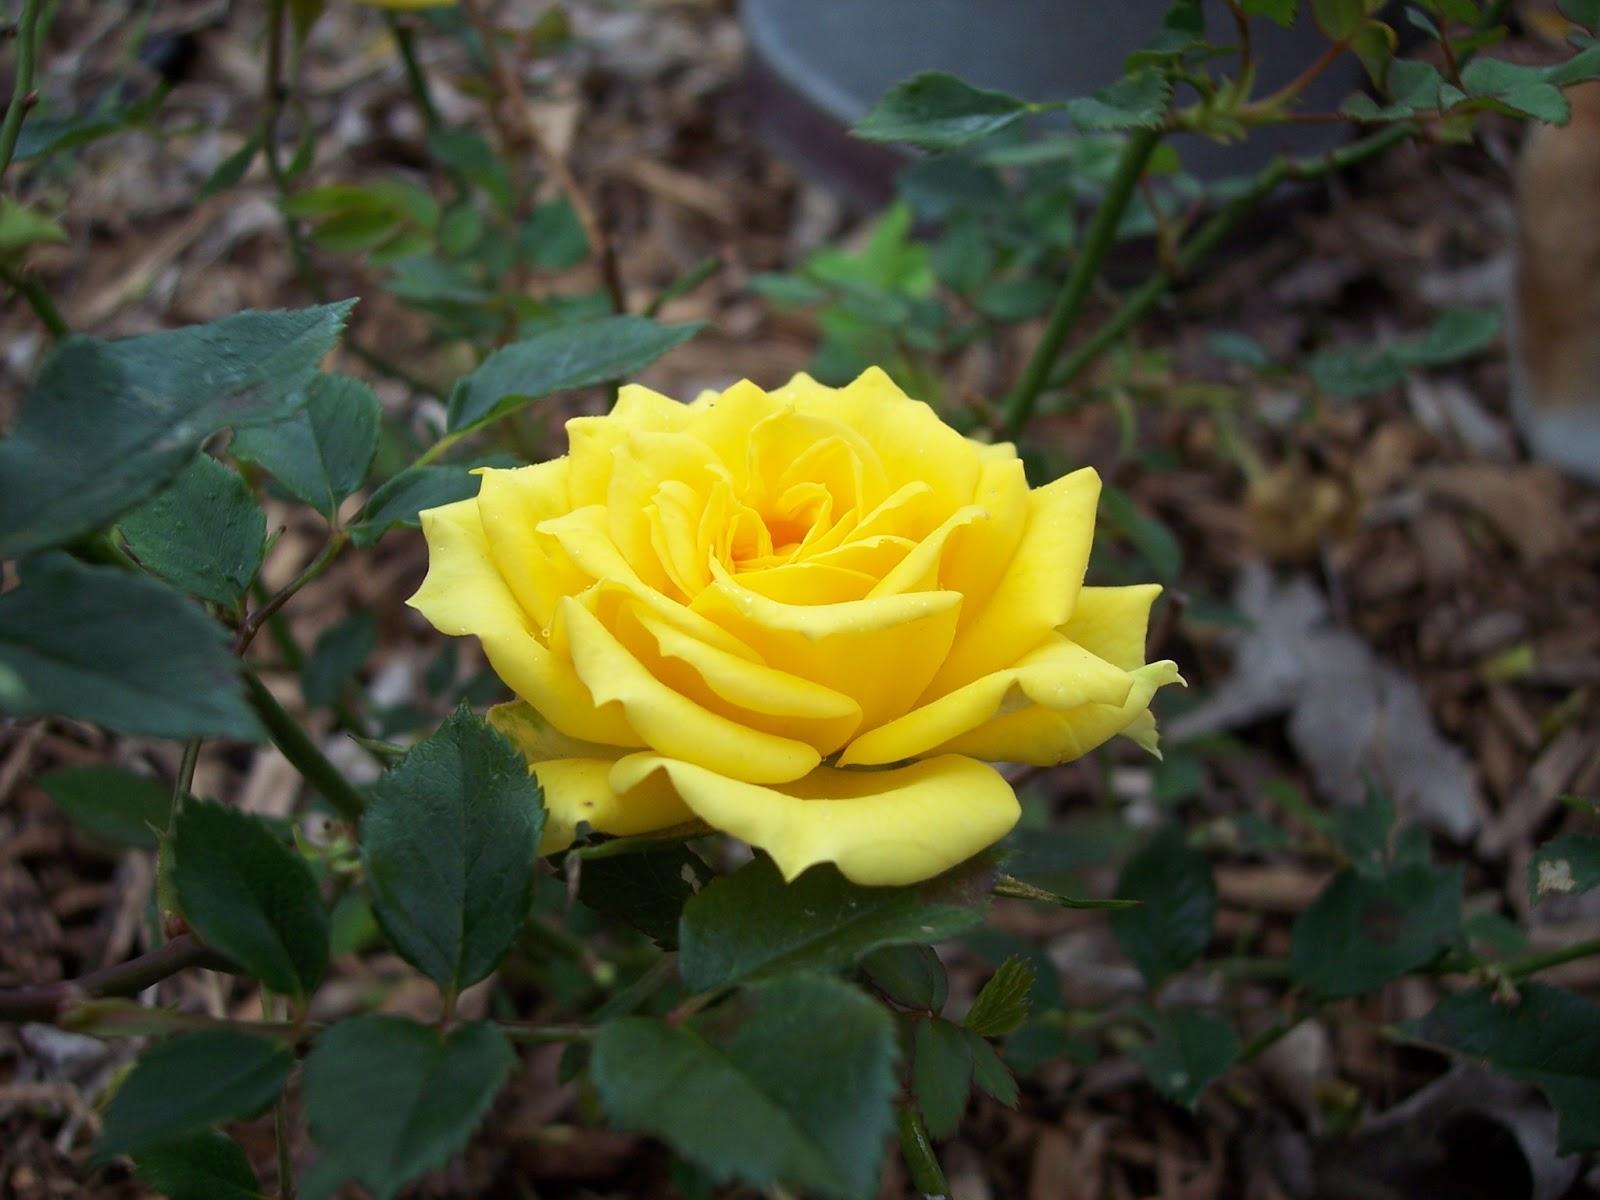 Climbing Yellow Rose Bush The yellow rose is a miniature